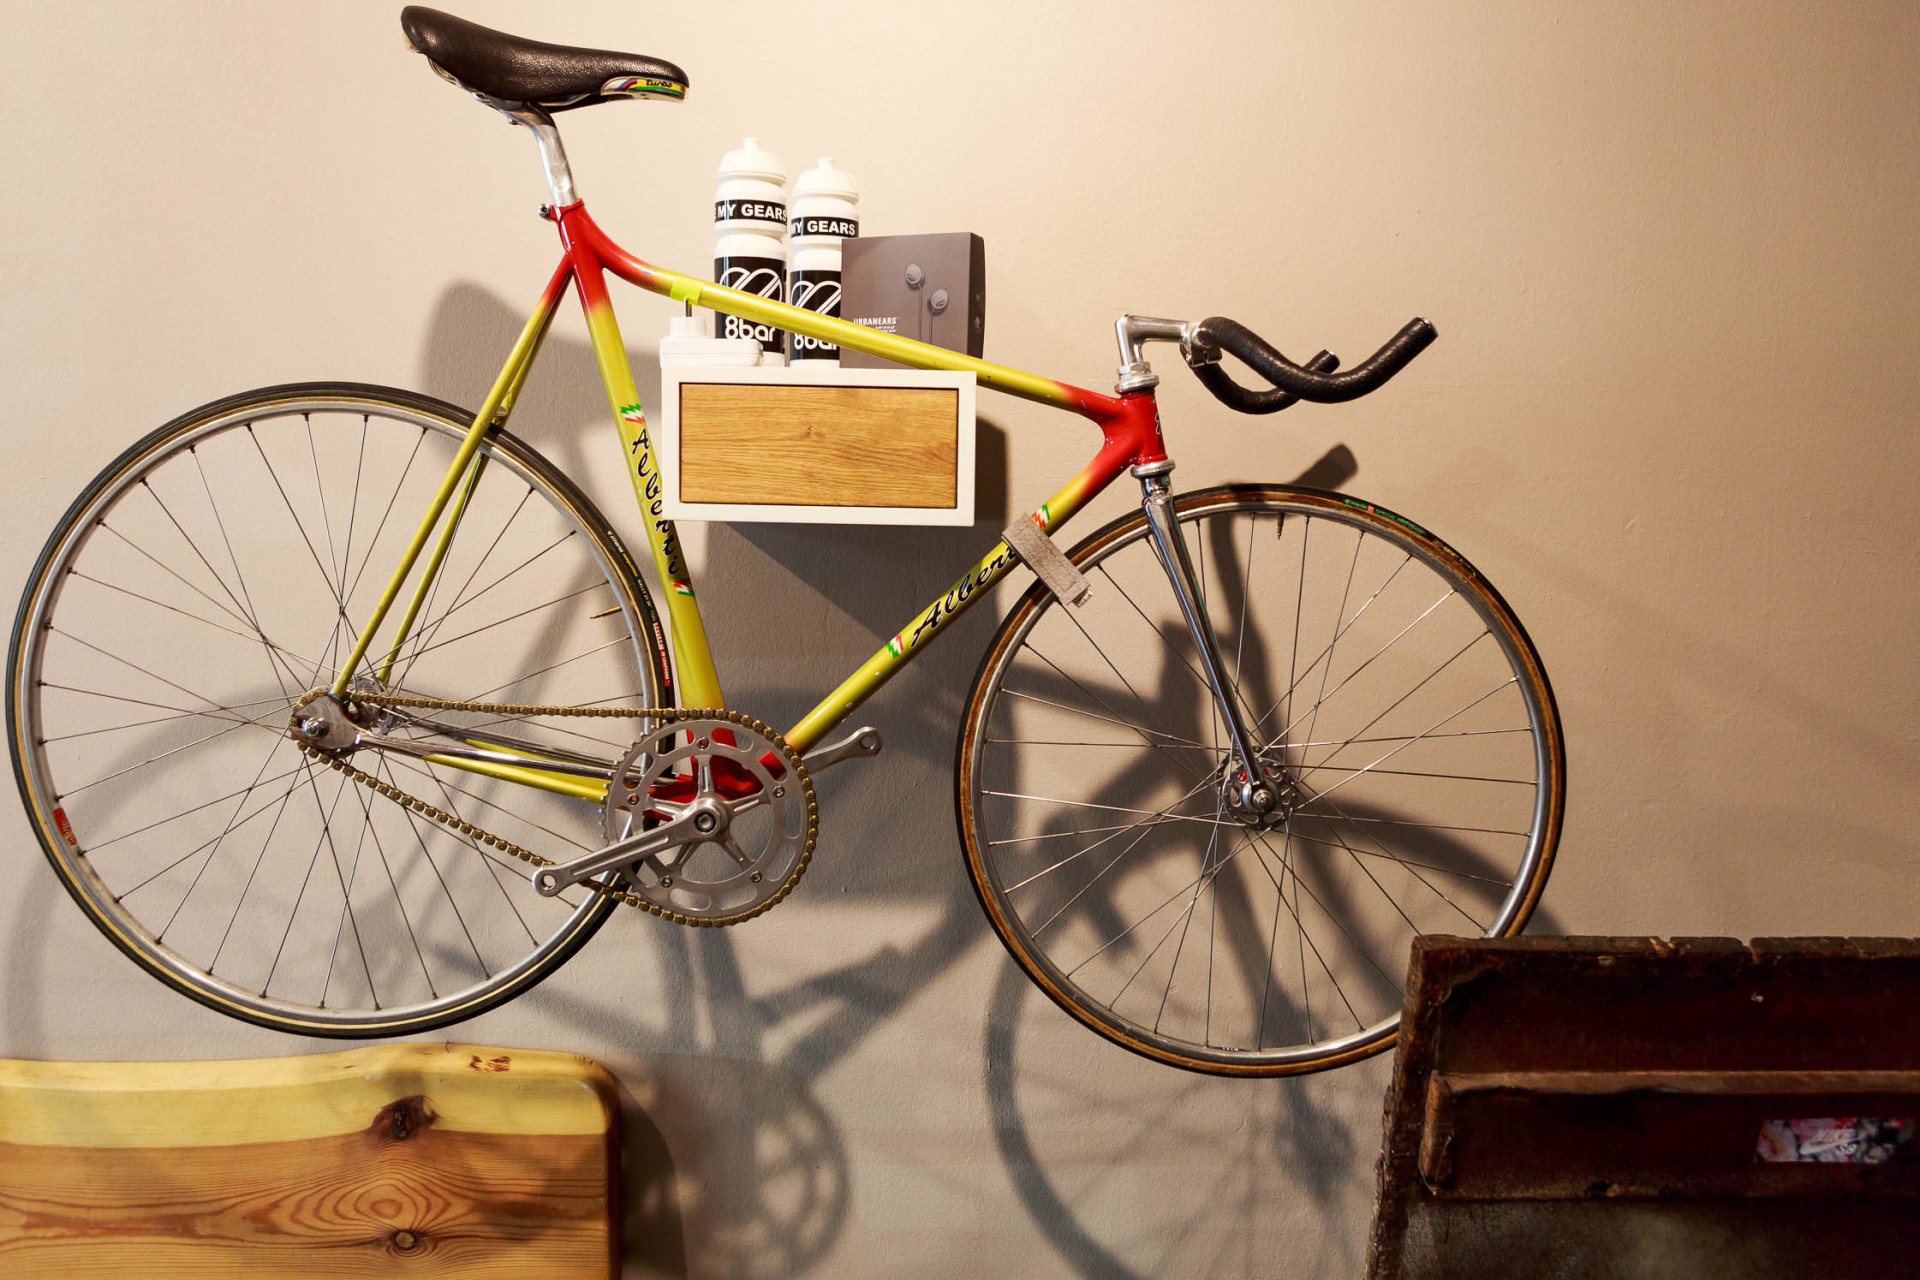 13-Standert-Bike-Store-Berlin